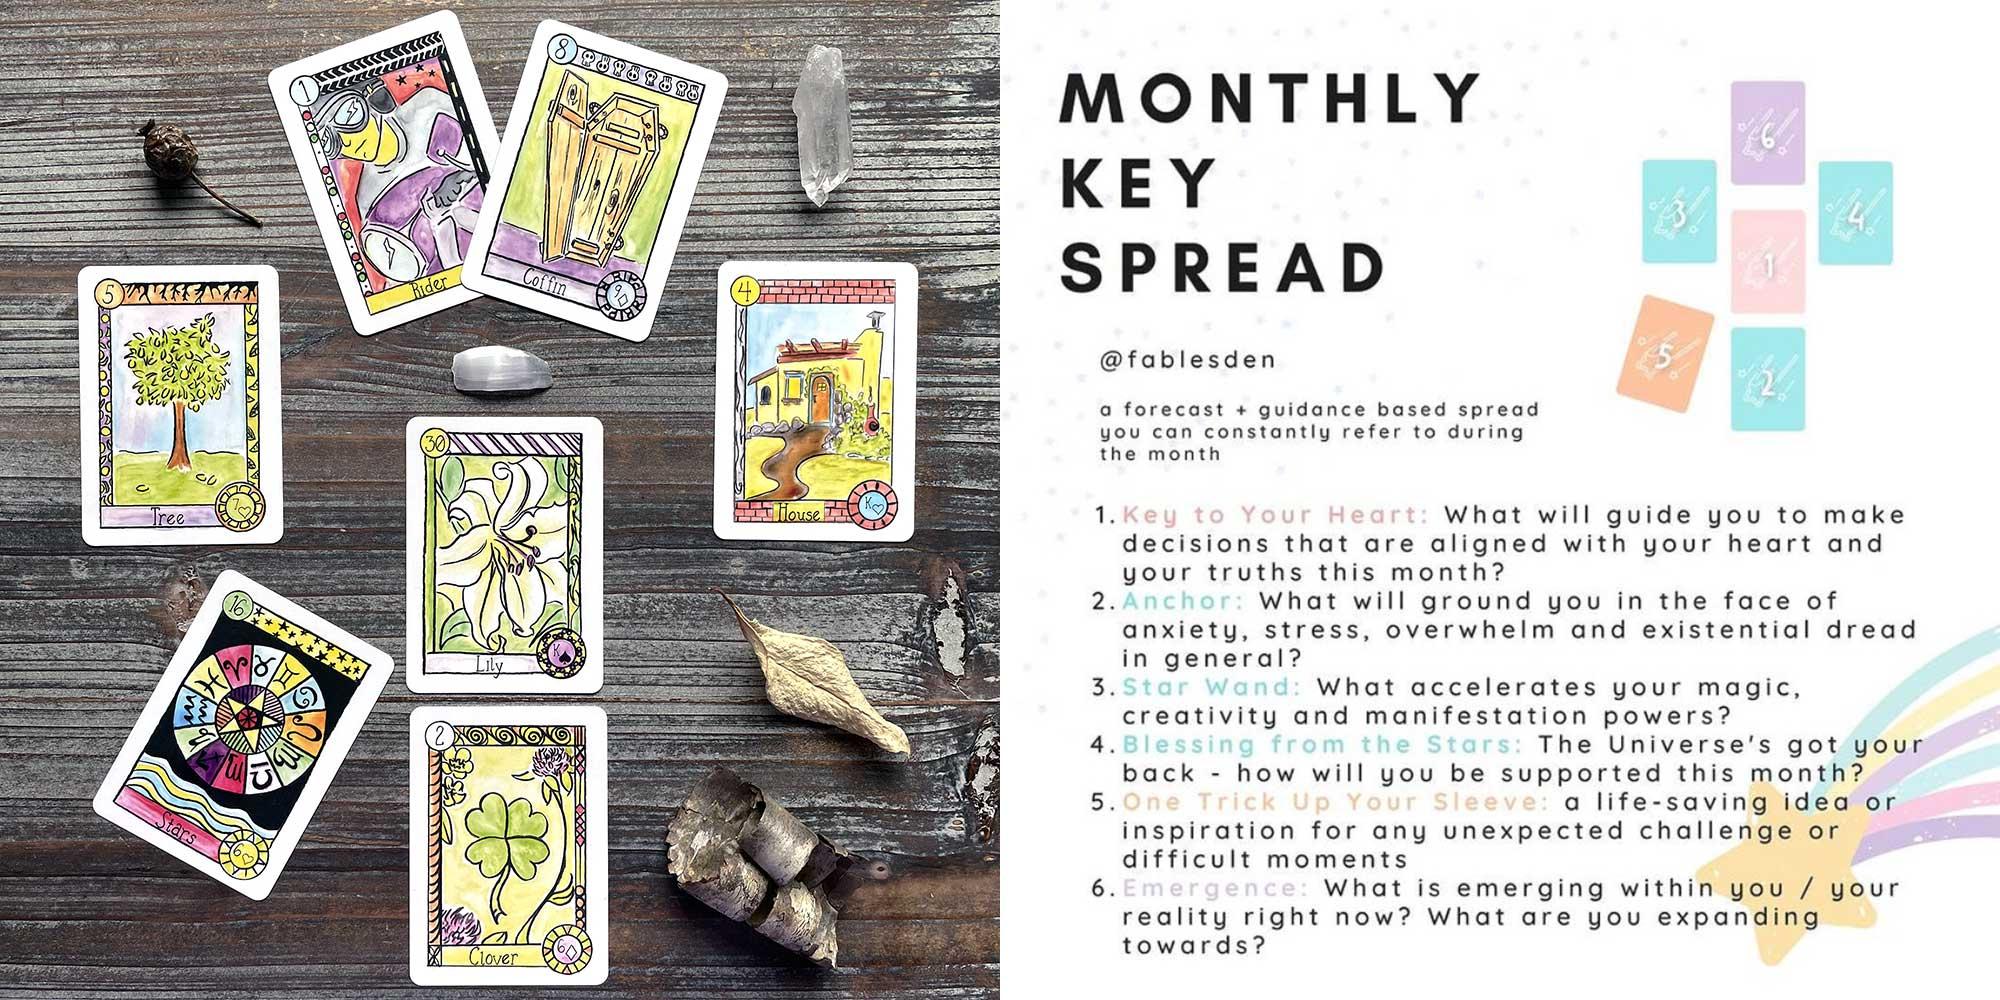 Monthly Key Spread - Little Lulu's Lucky Lenormand